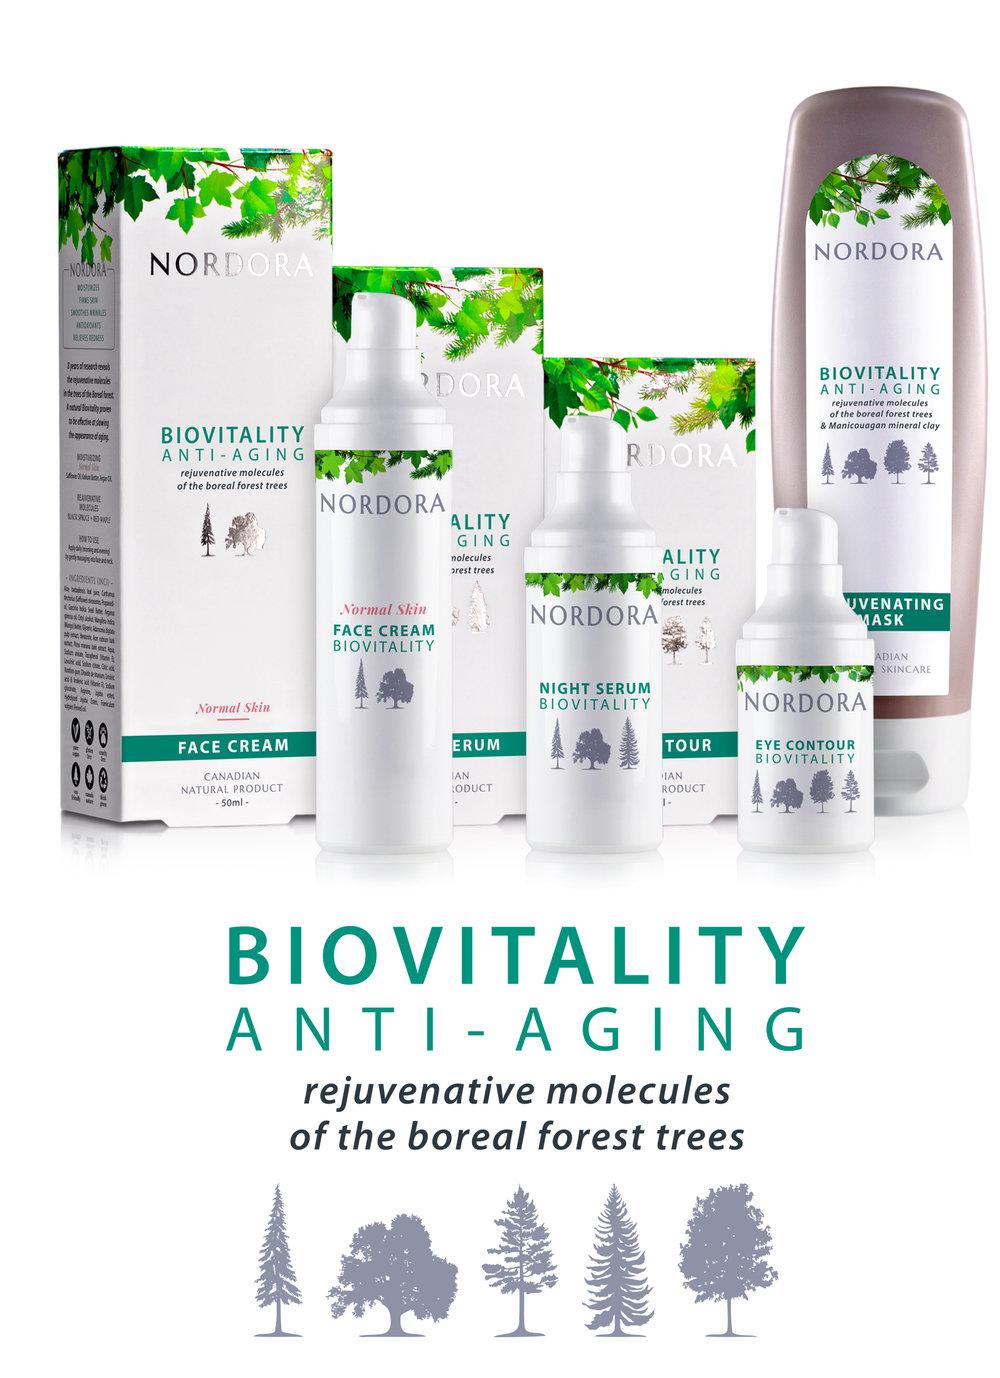 Nordora_BioVitality_GroupShot_EN.jpg